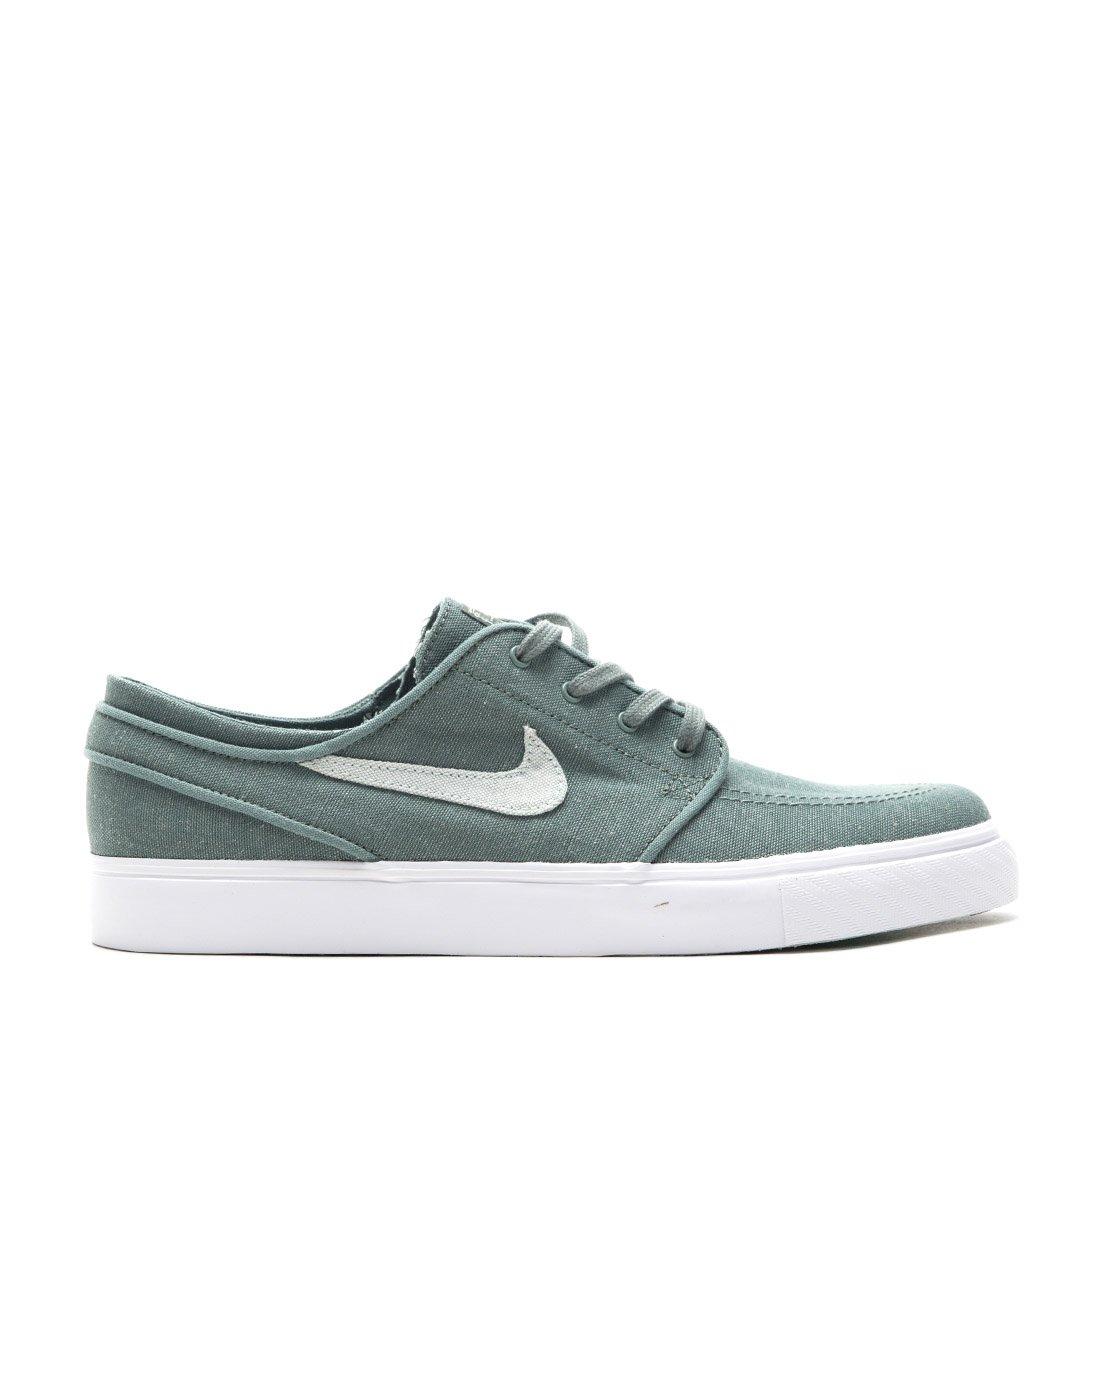 size 40 e71ef 844a7 Galleon - Nike Men s Zoom Stefan Janoski Skate Shoe (10.5 D(M) US, Clay  Green Barely Grey-Menta)